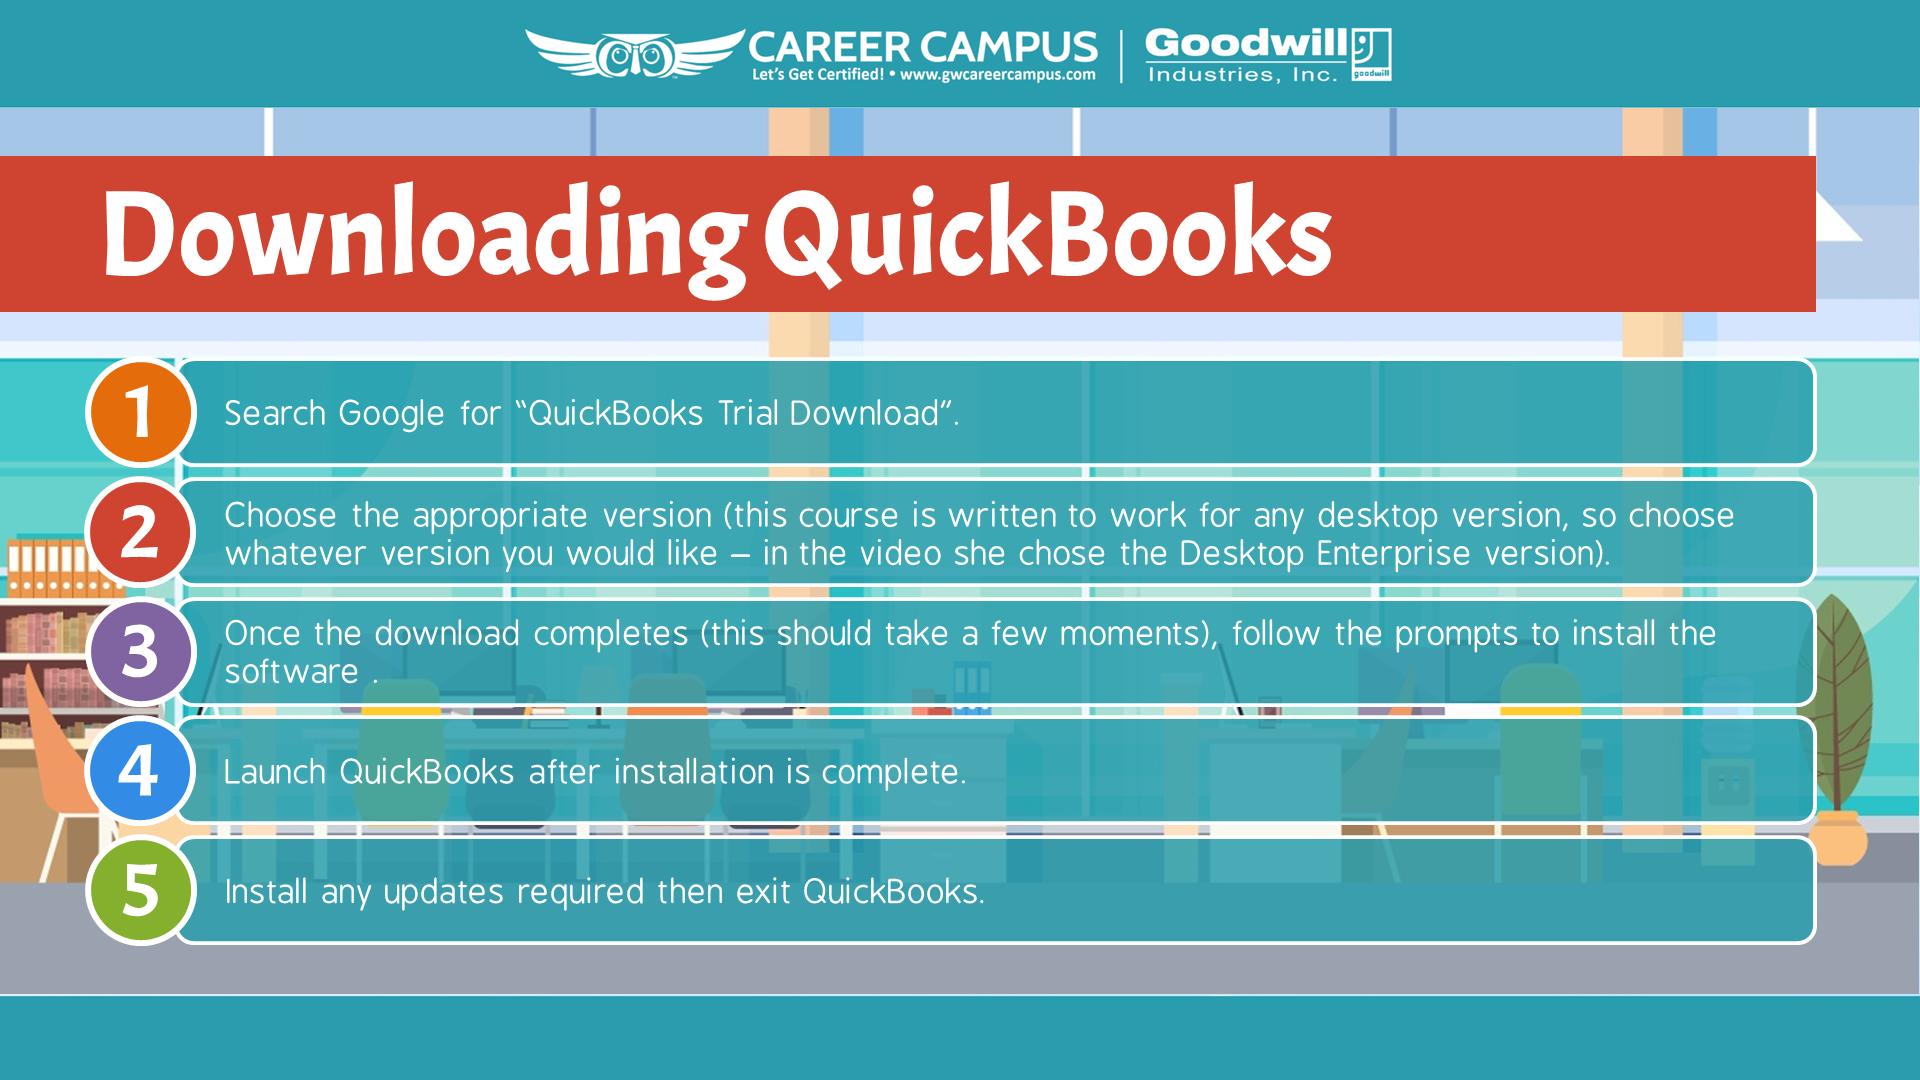 quickbook download